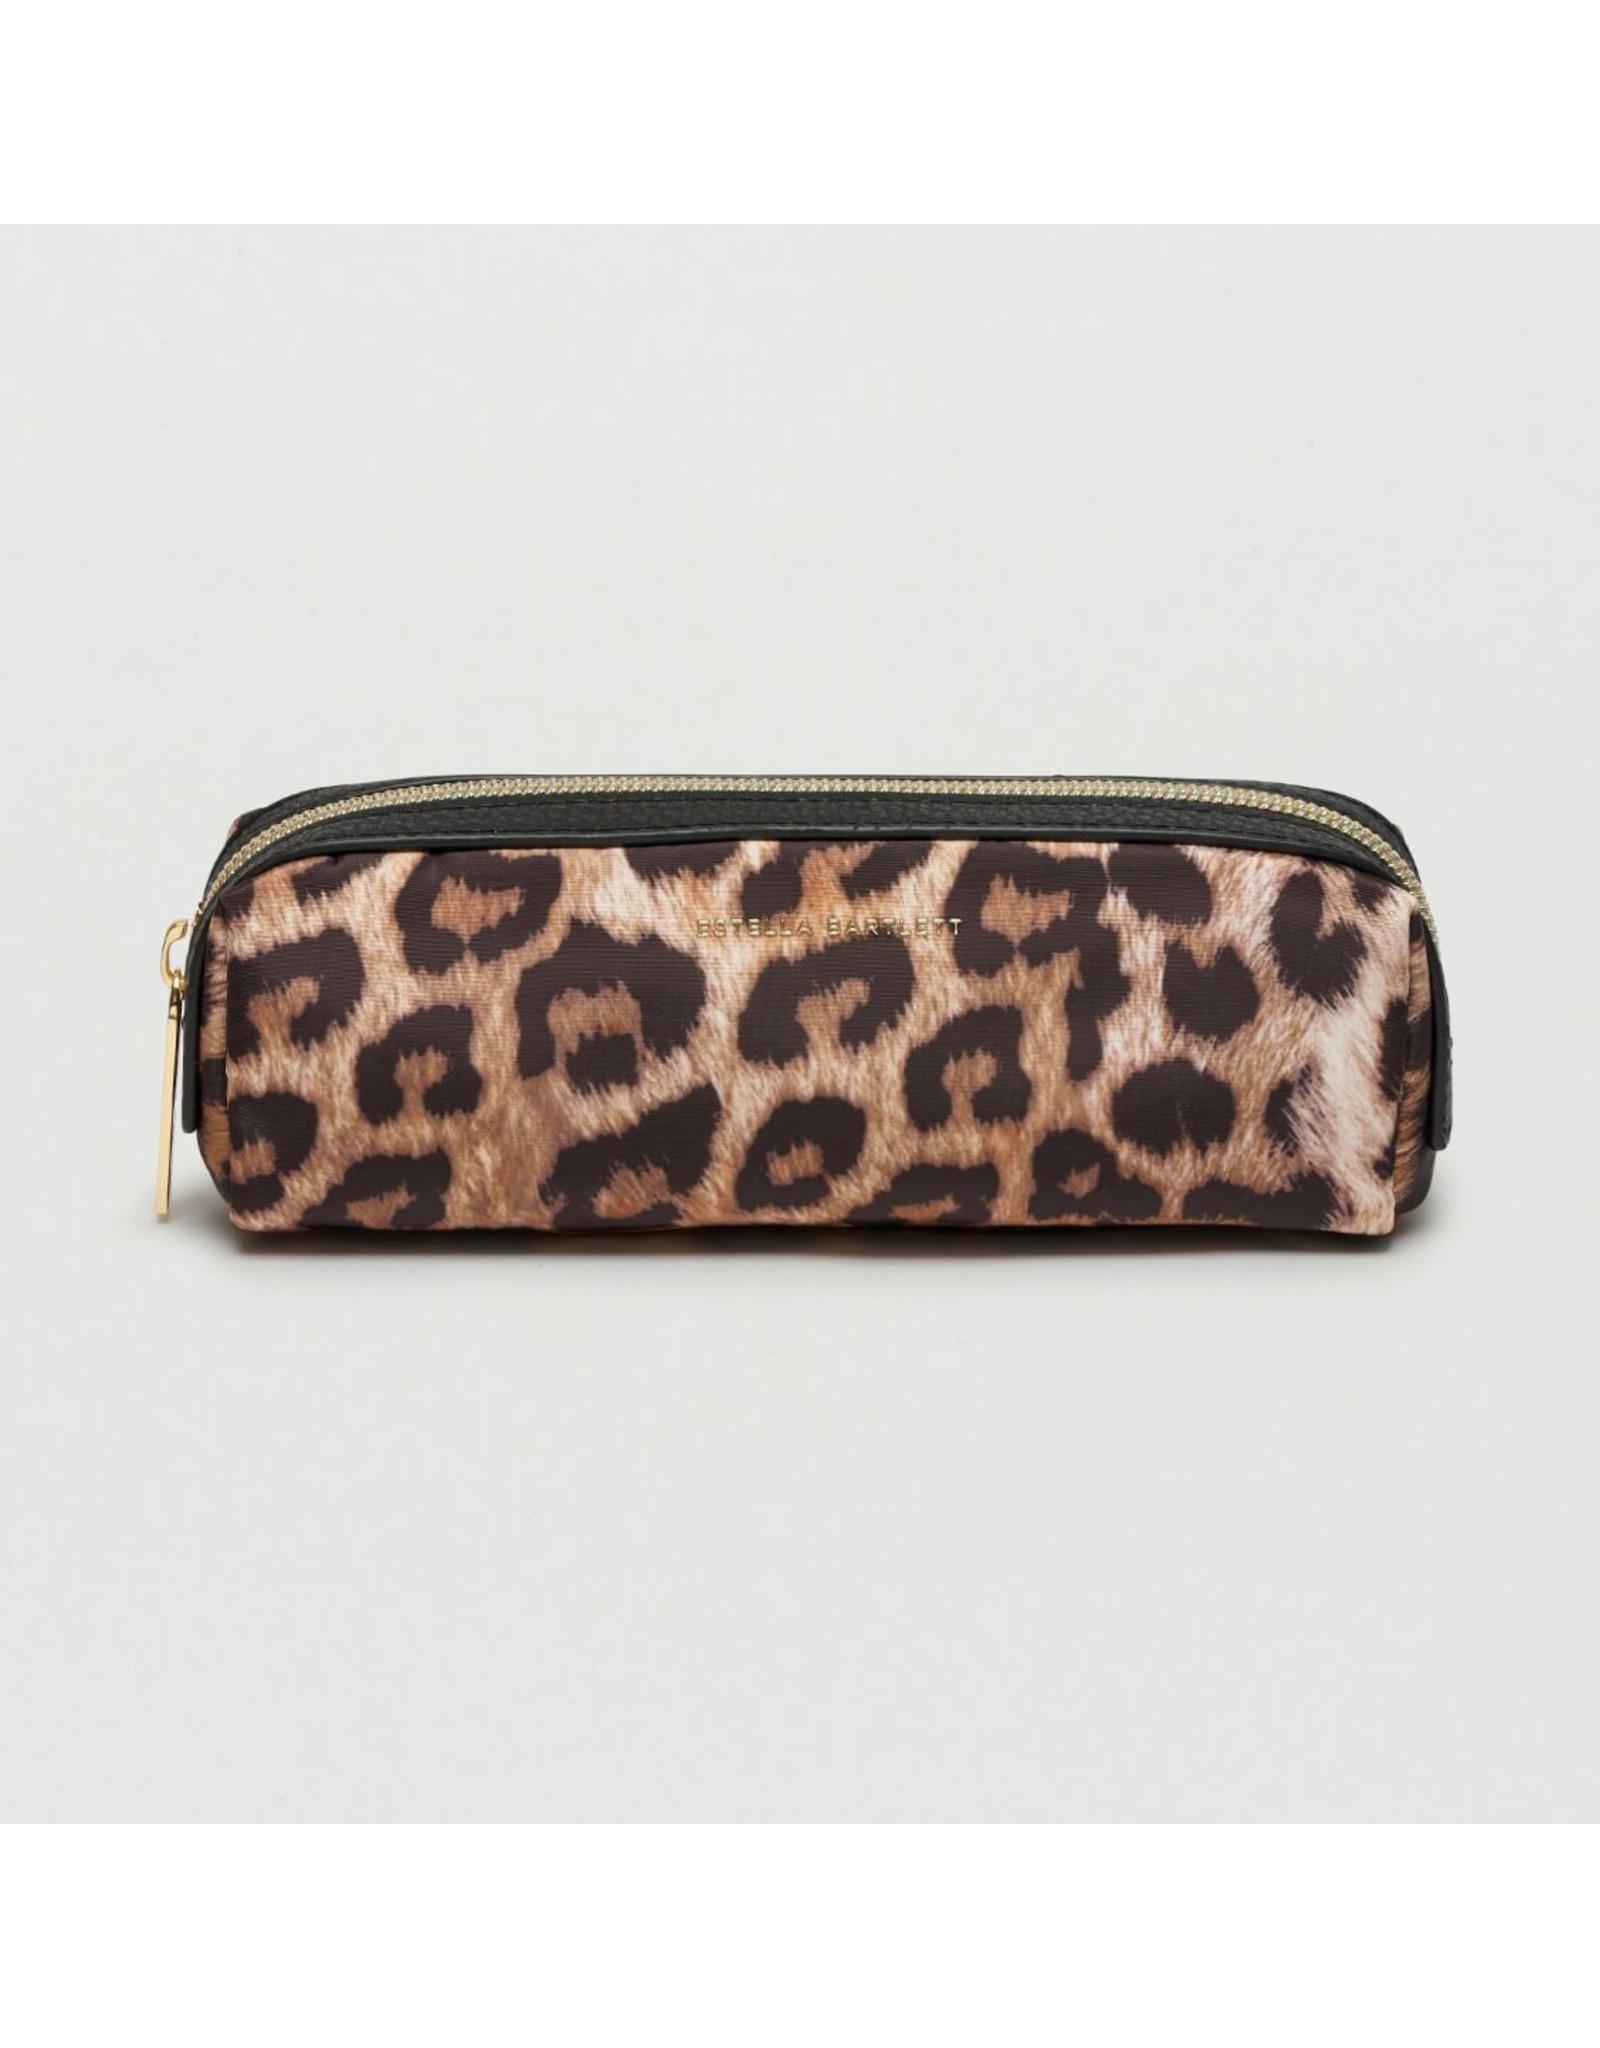 Estella Bartlett Leopard - Make-uptas / Pennenzak